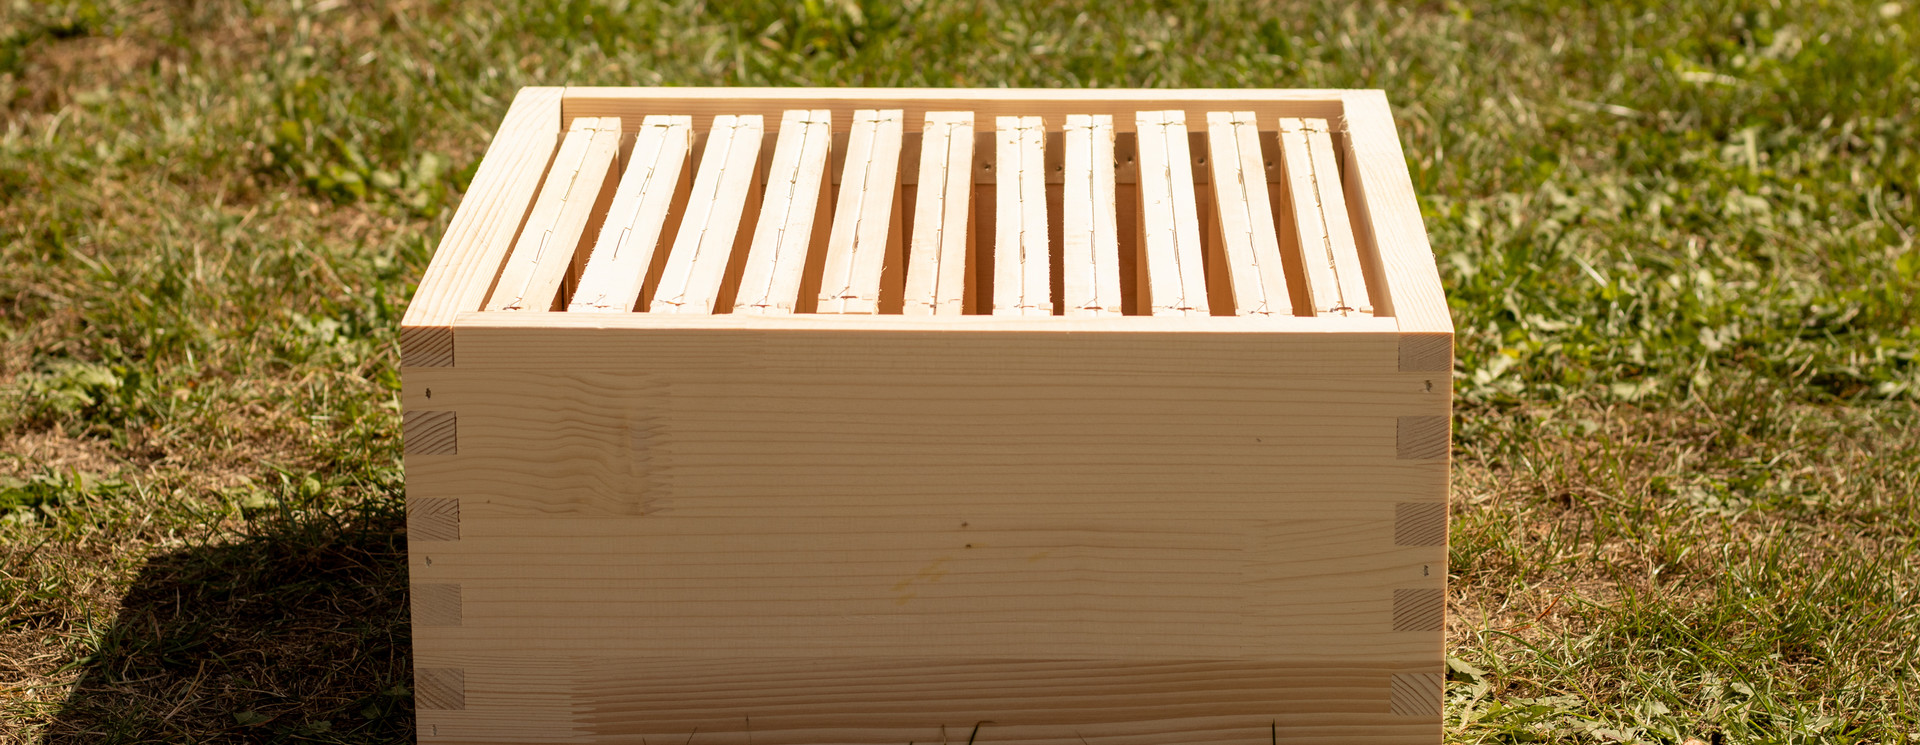 Houten bijenkasten